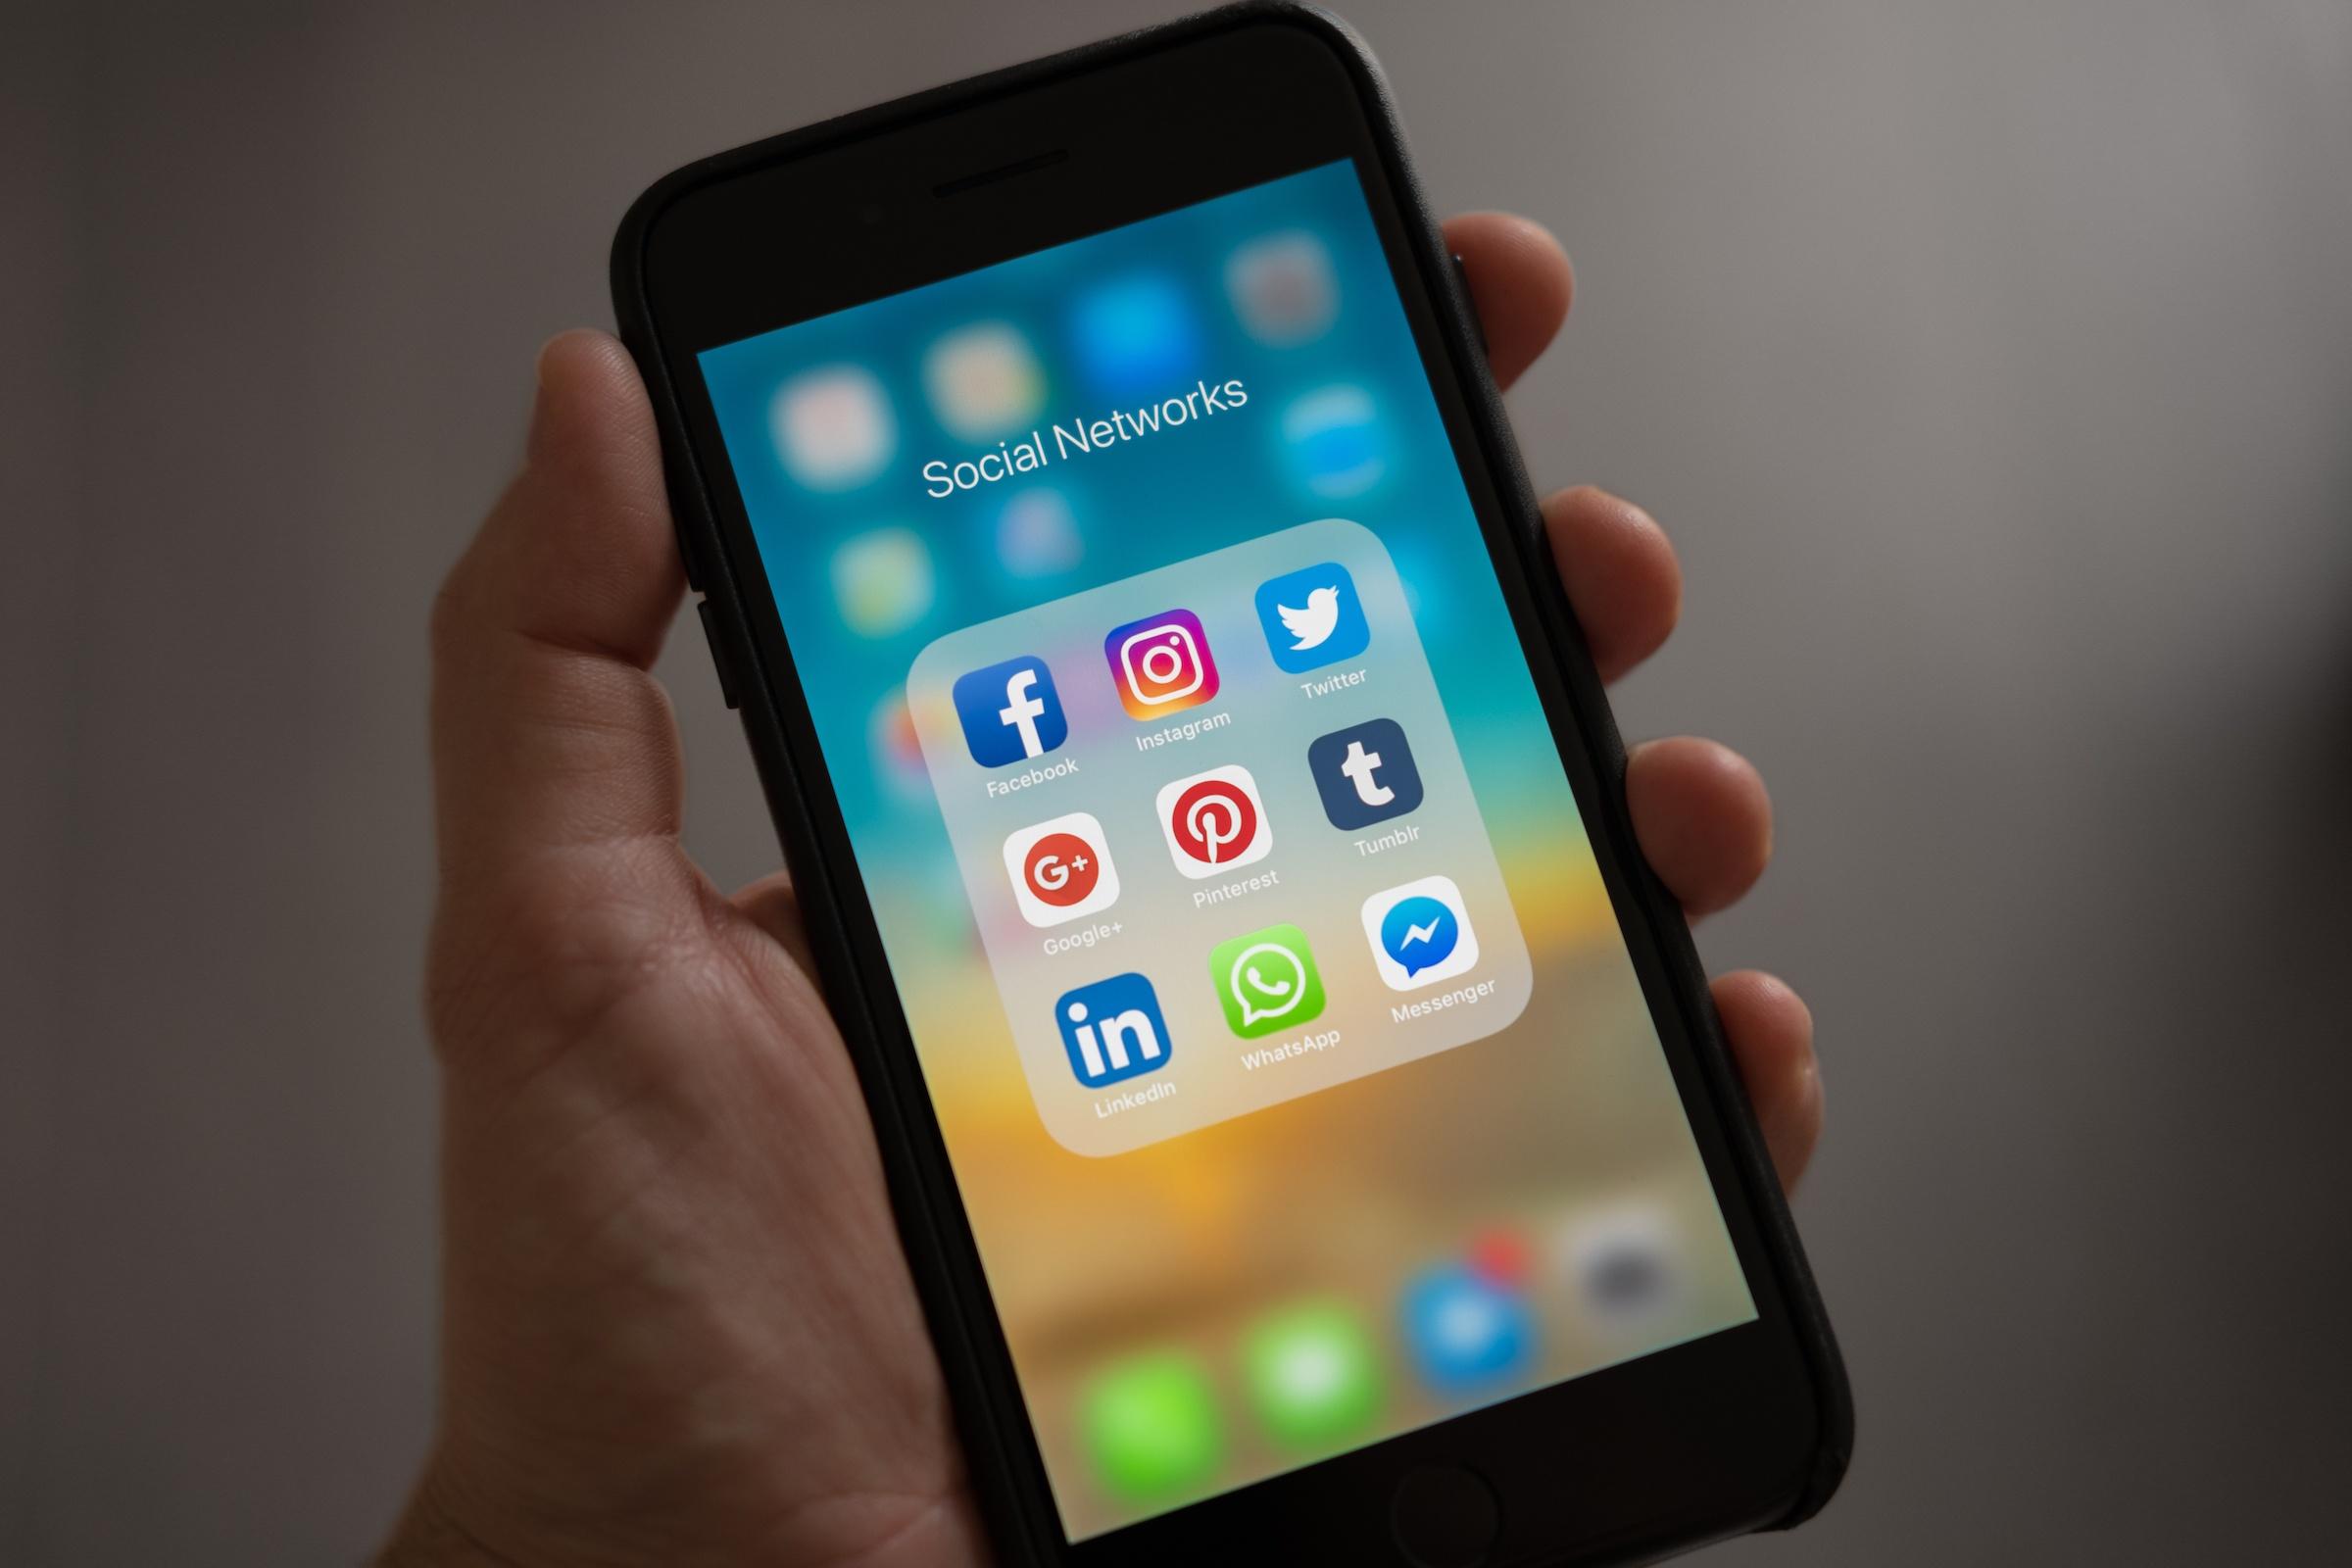 social networks-607812.jpeg